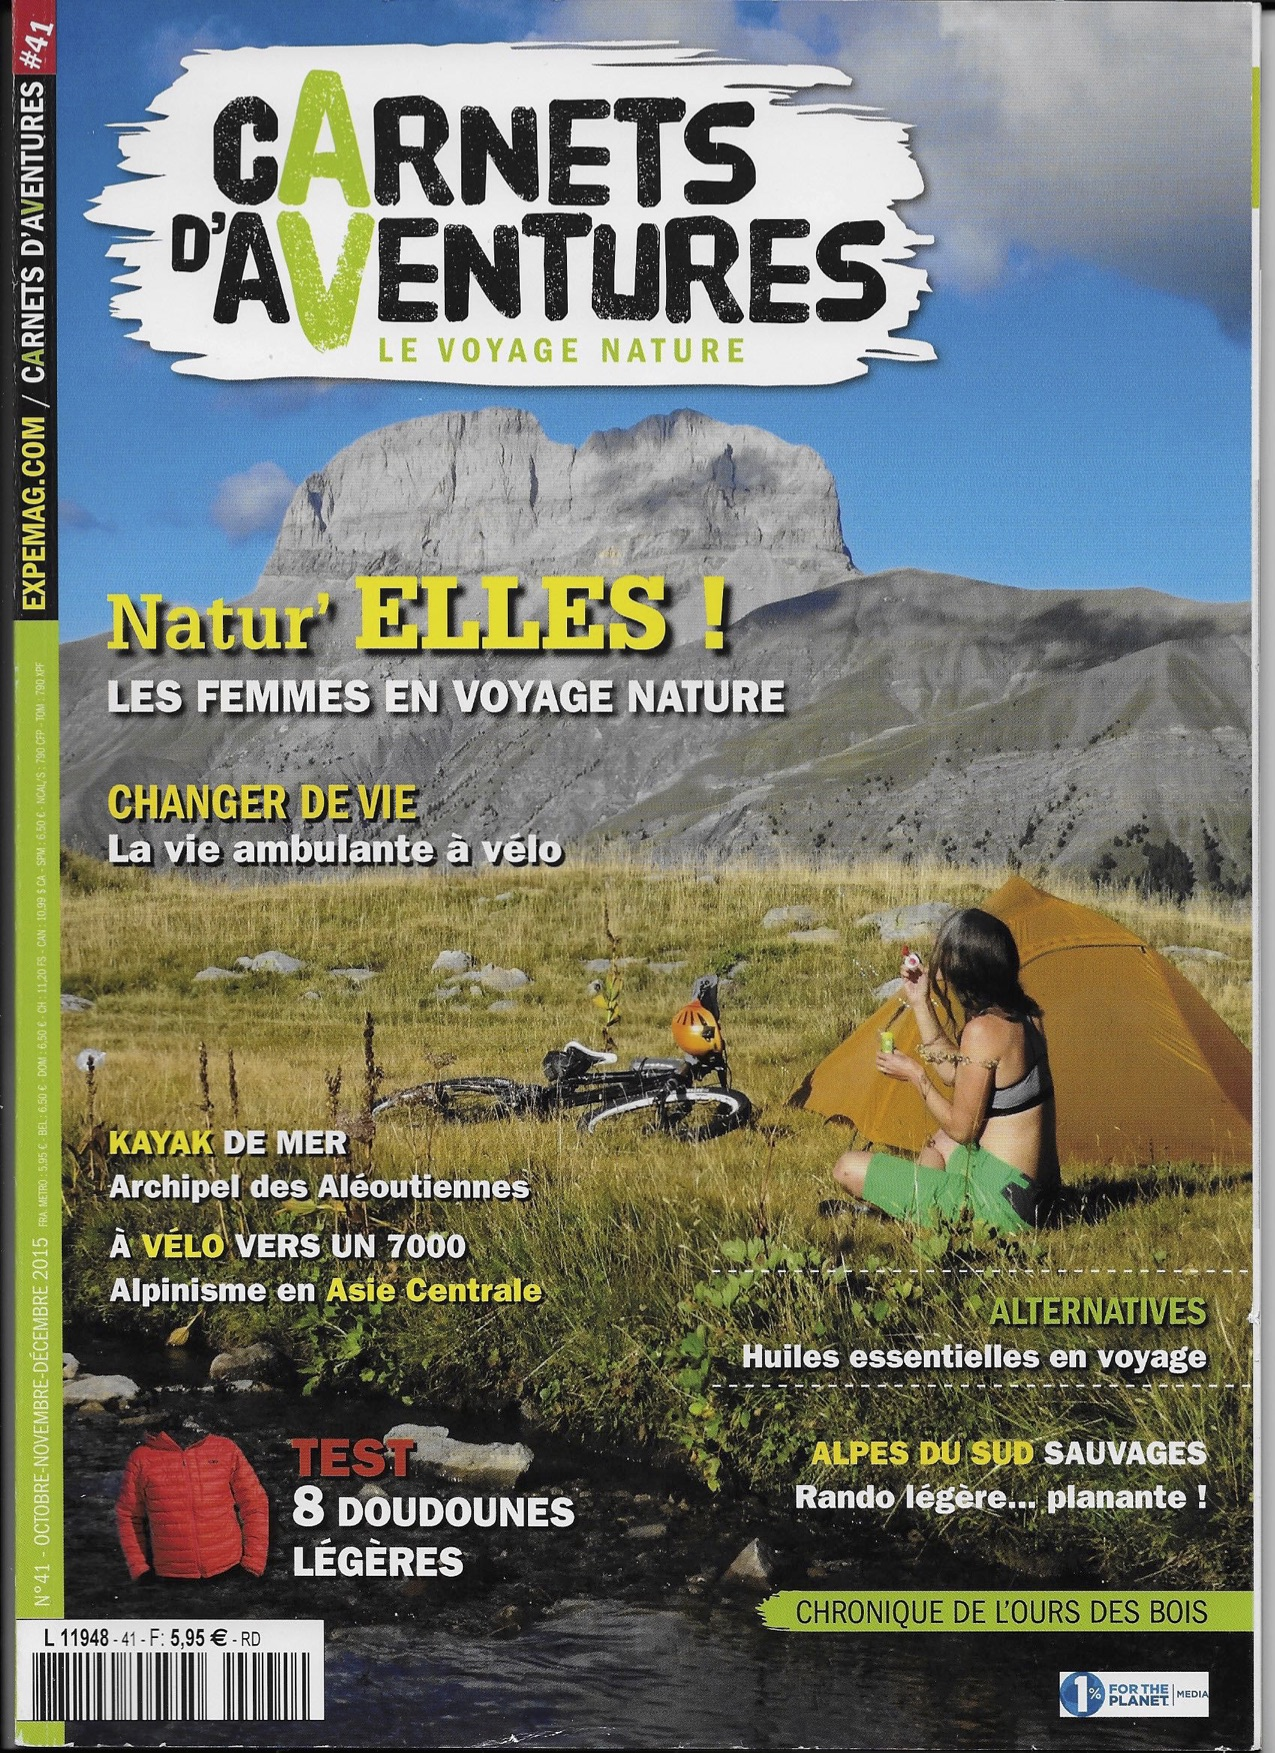 Carnets d'aventure - Octobre 2015 (   Lien   )